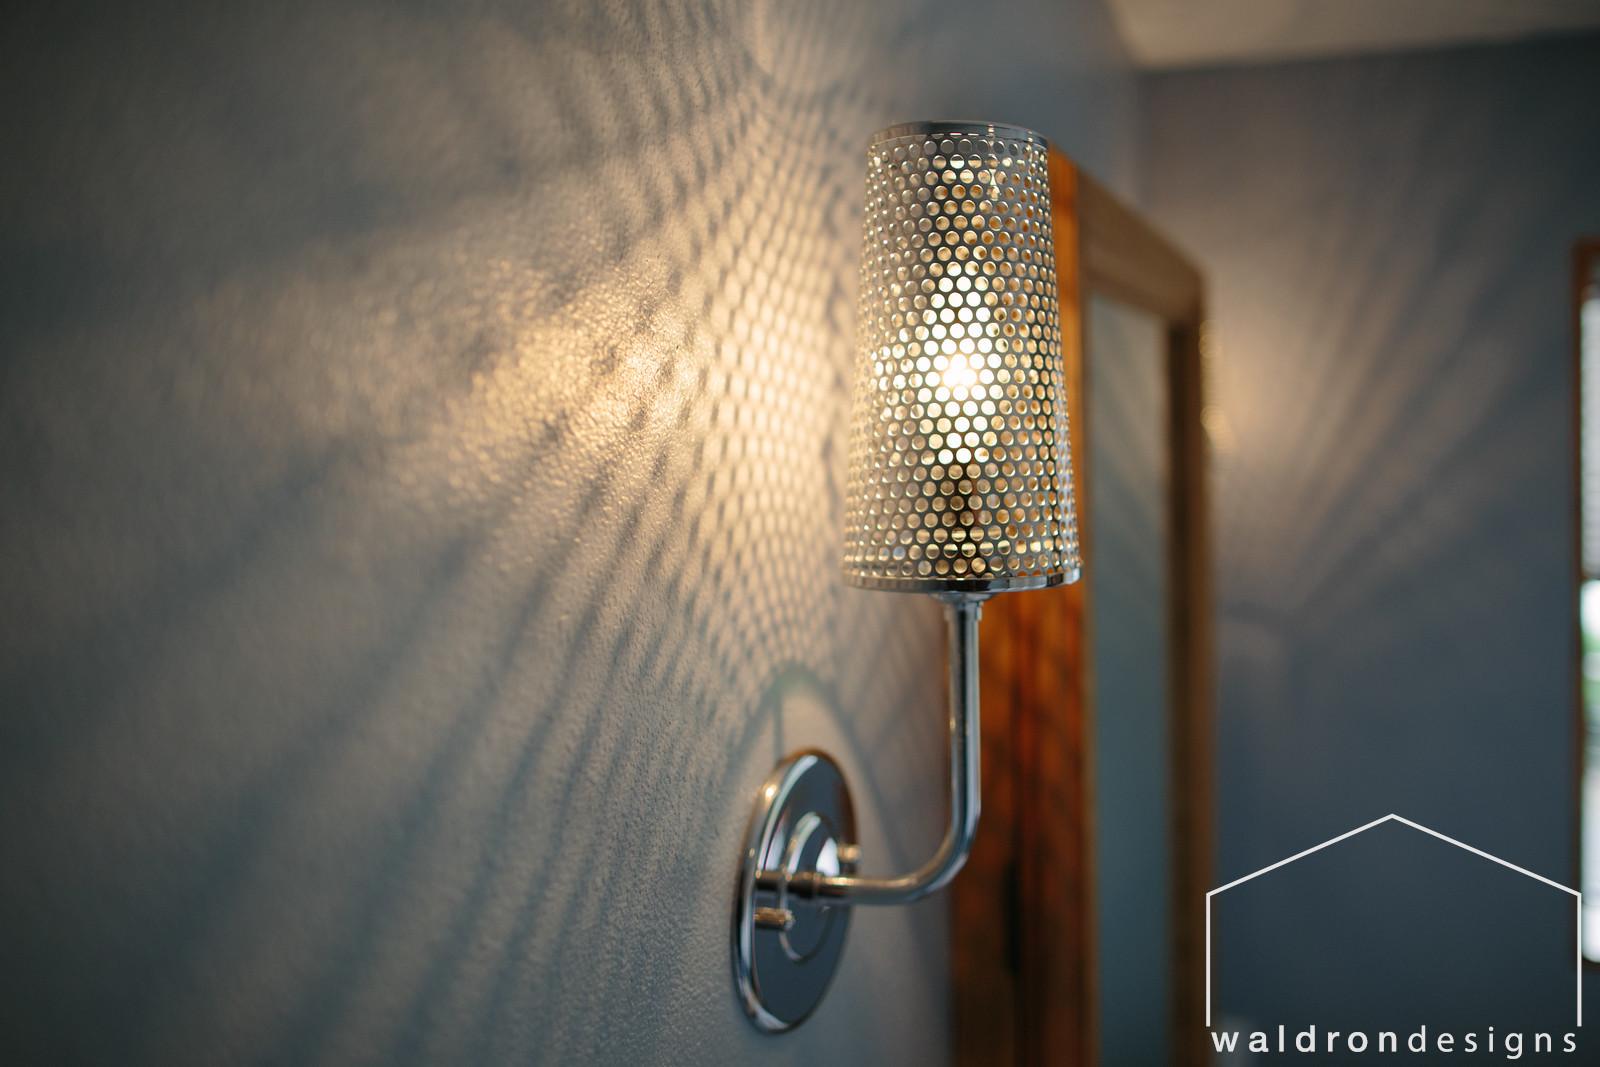 light-patterns-create-warmth-vashon-seattle-tacoma-interior-designer-waldron-designs.jpg